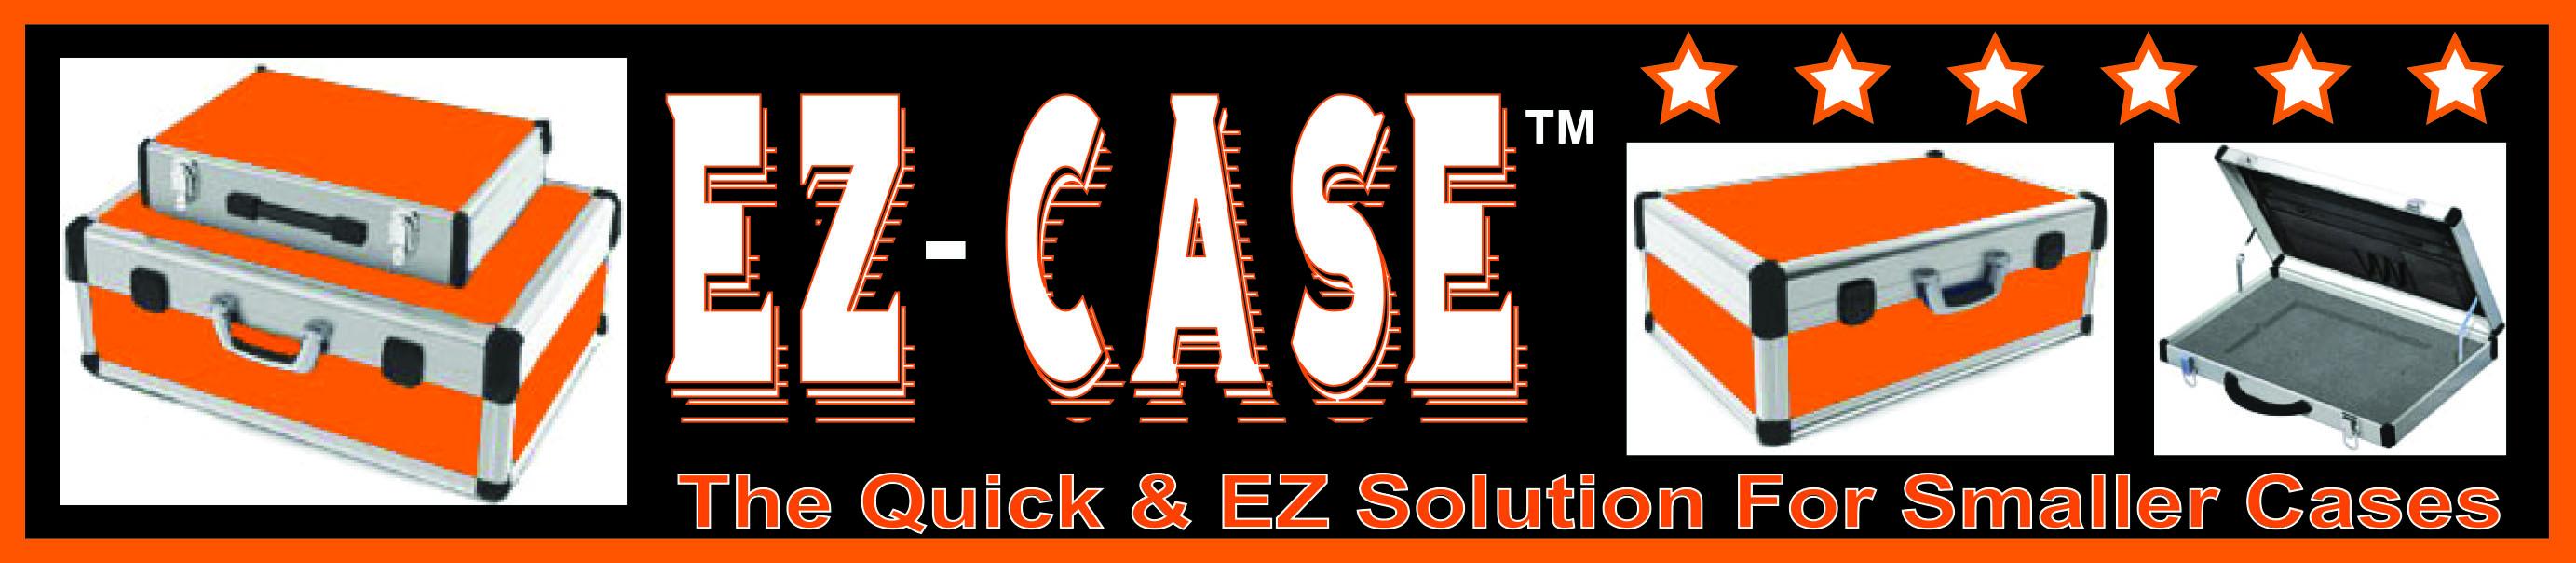 banner-ez-case-products-new.jpg